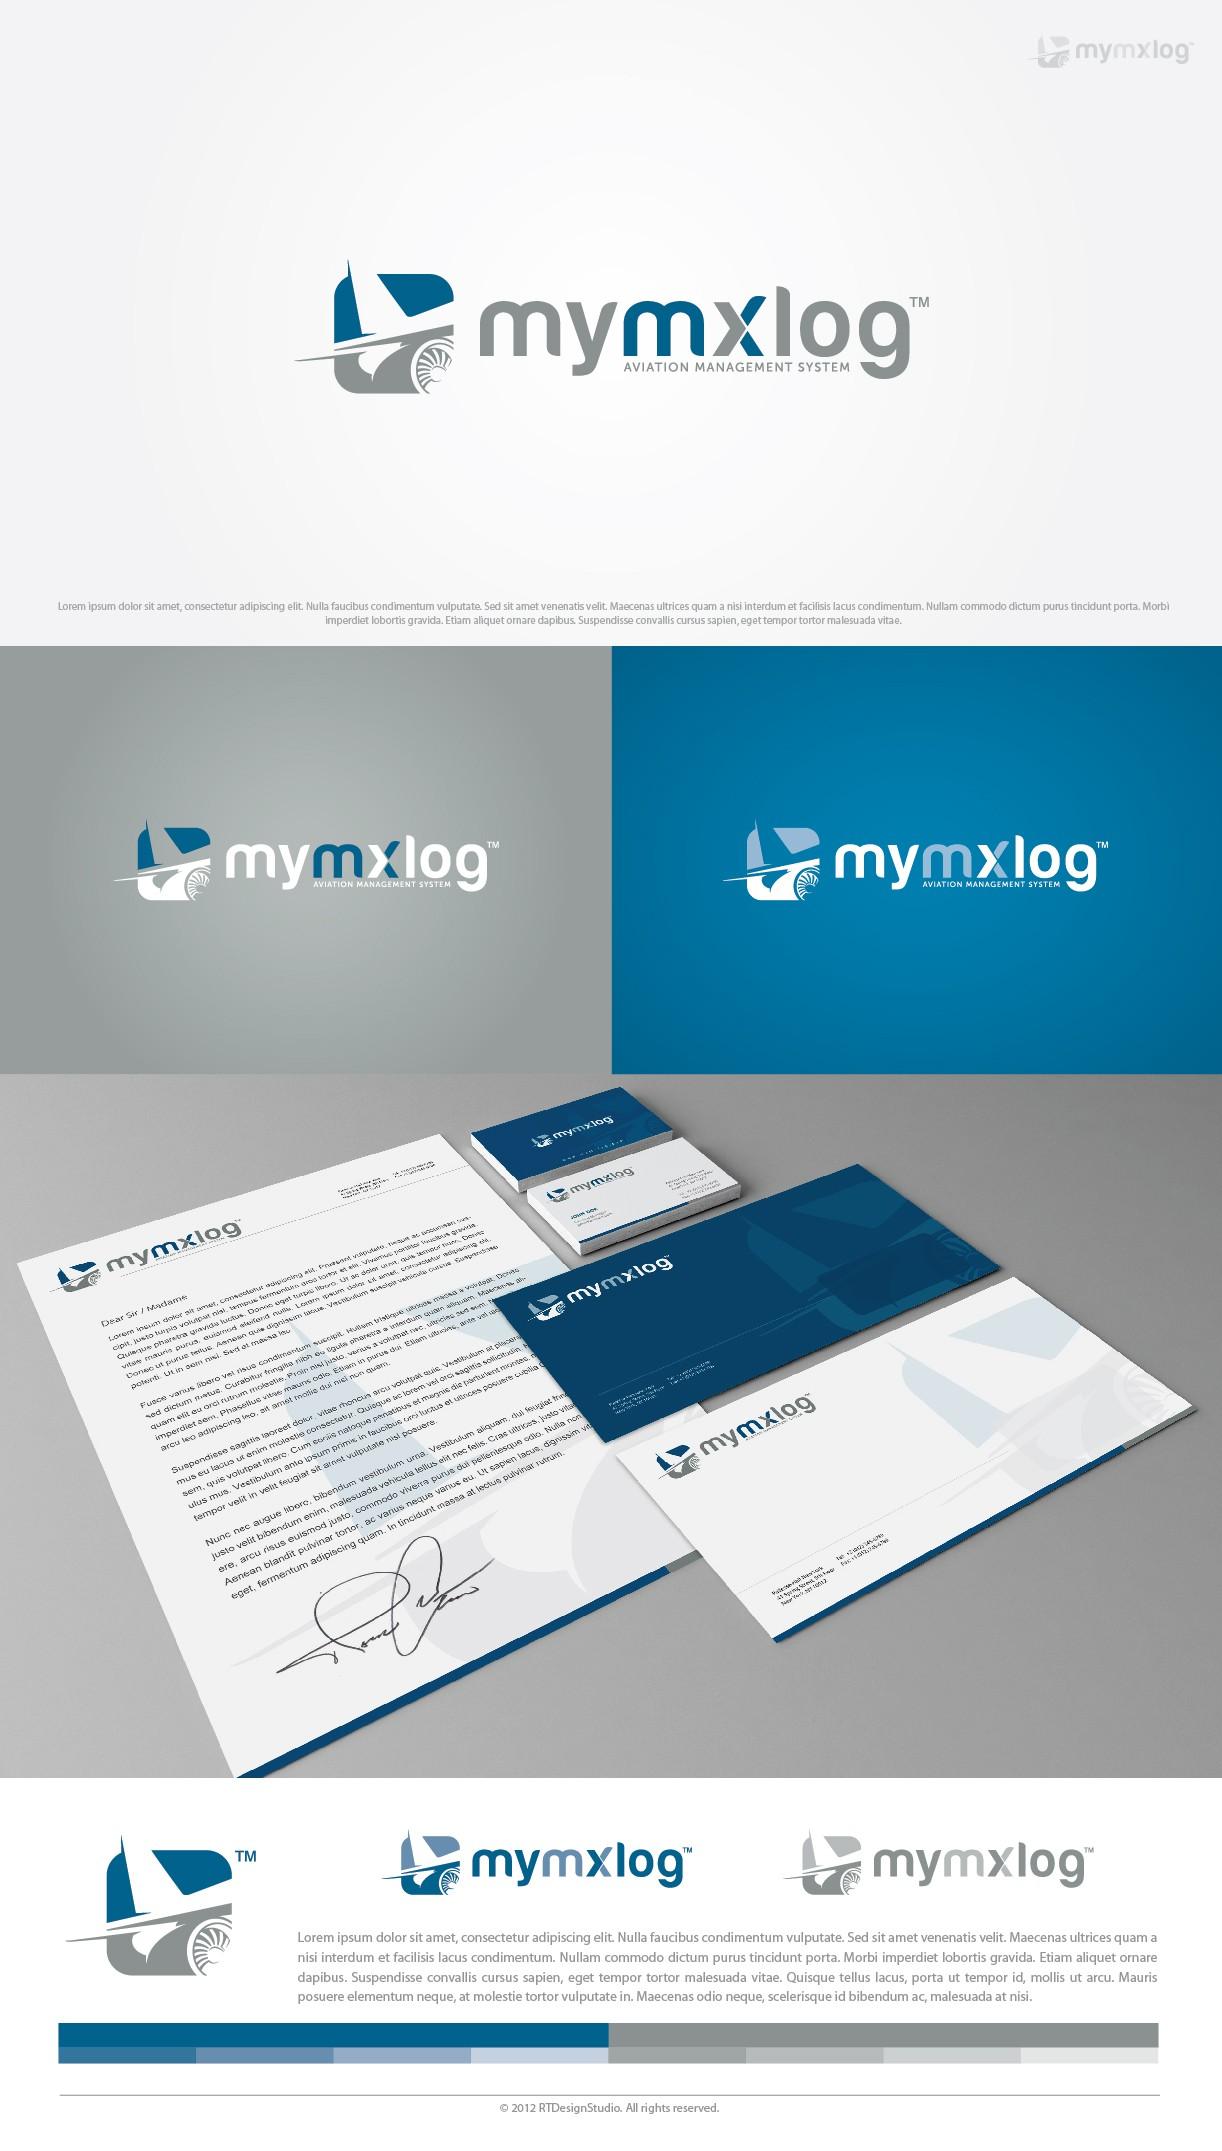 Logo for mymxlog.com - Service for Aviation Professionals